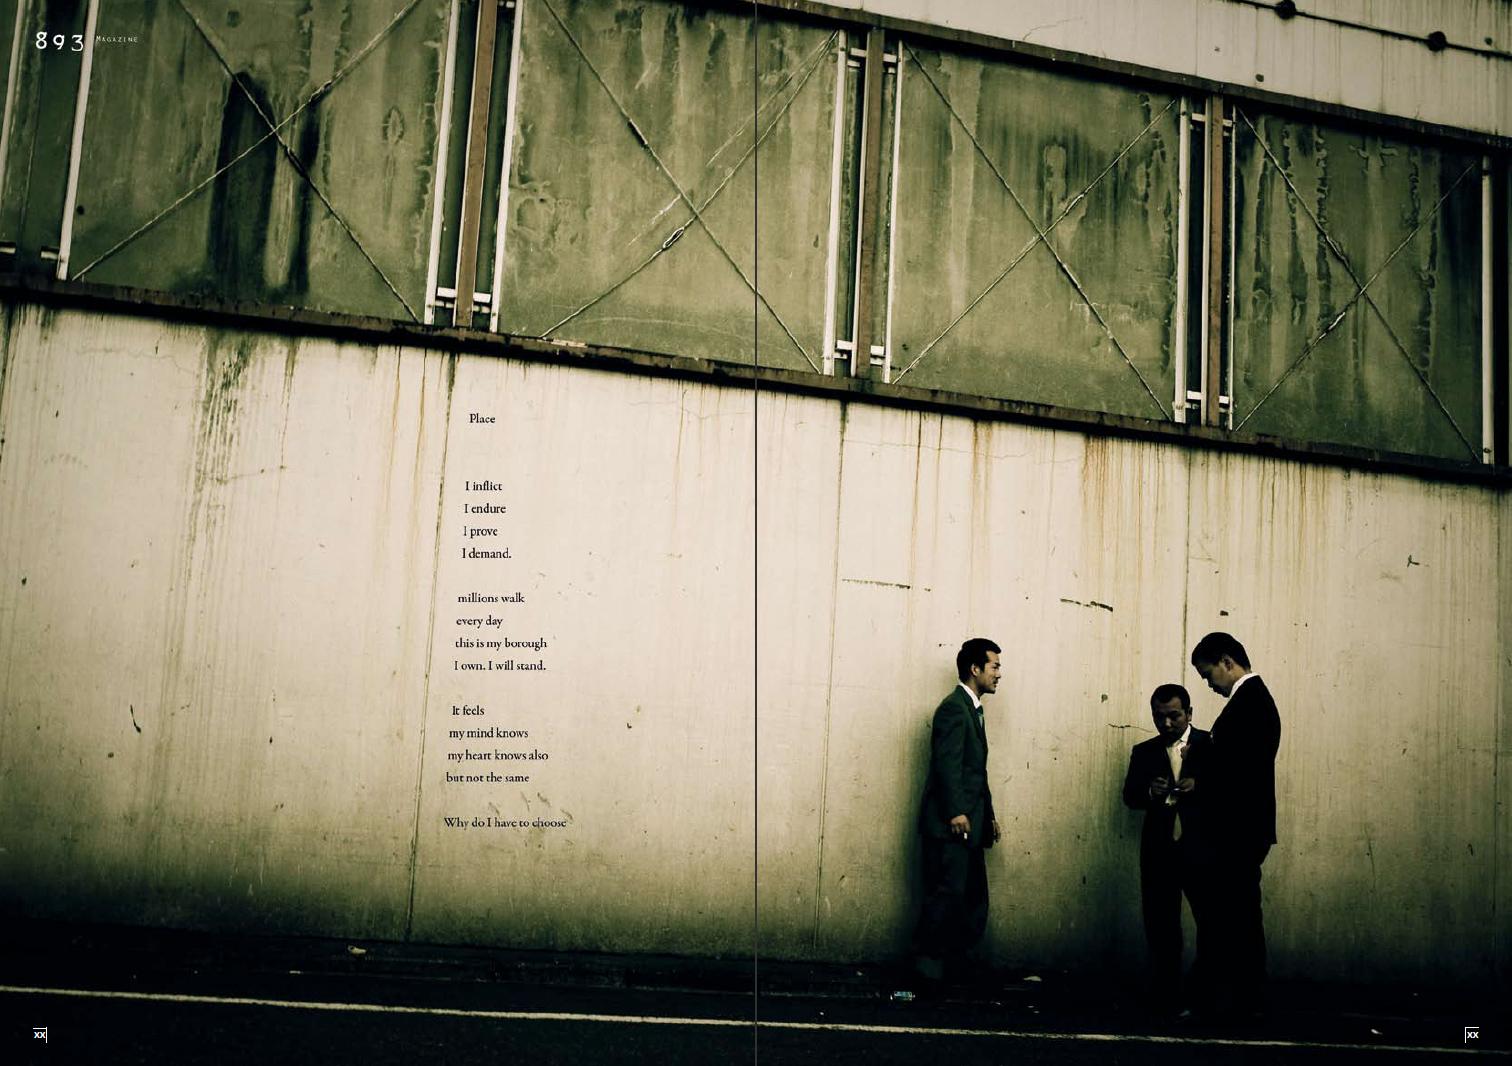 interview_fotografie_01-11_p7-8.jpg